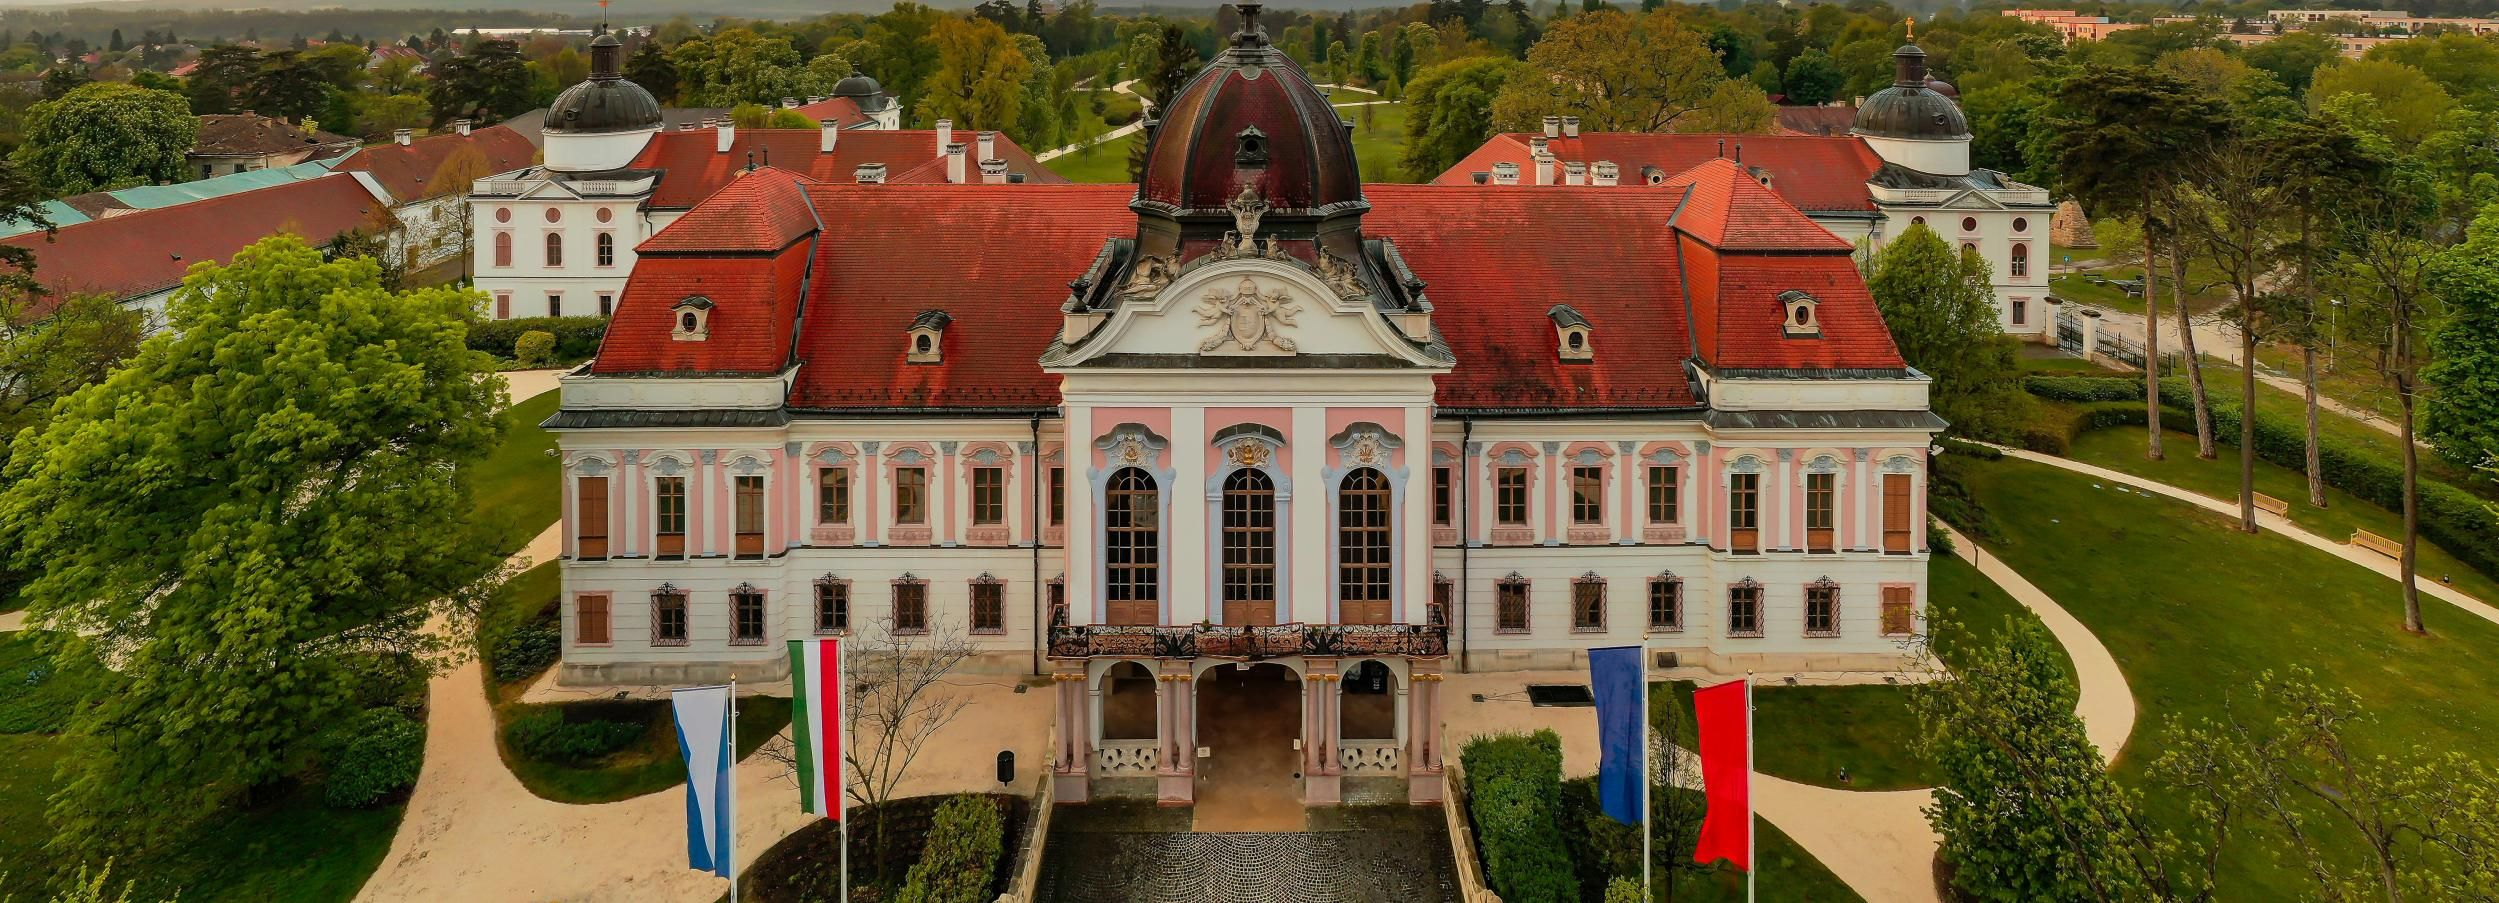 Gödöllő:布達佩斯皇家茜茜公主導遊